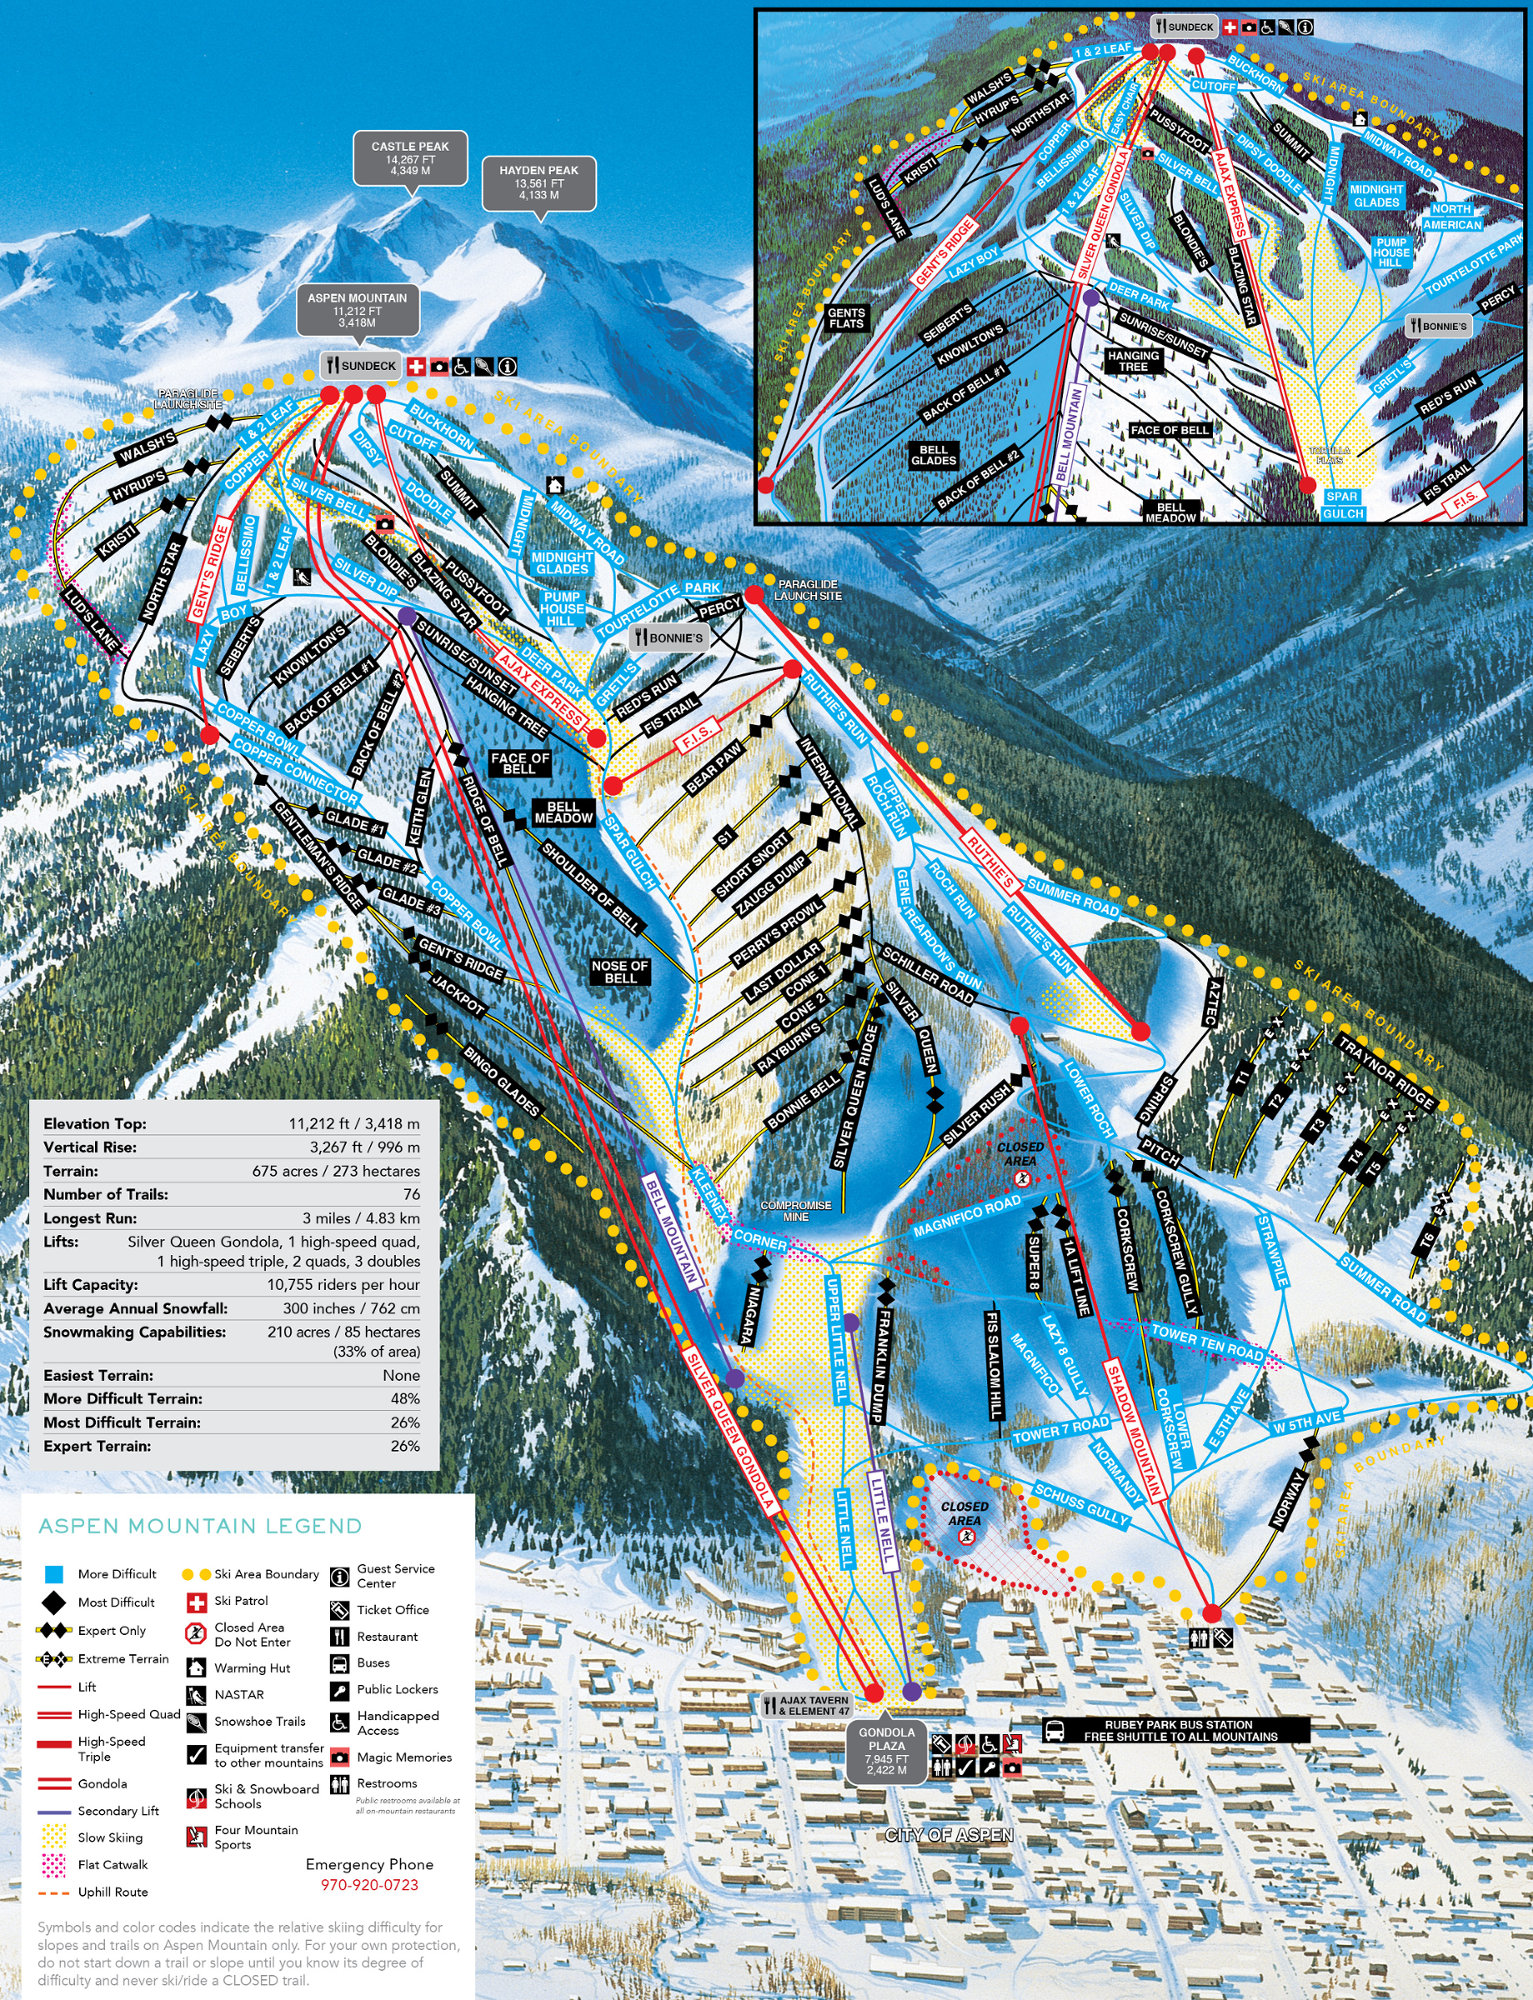 Aspen Mountain Plan des pistes